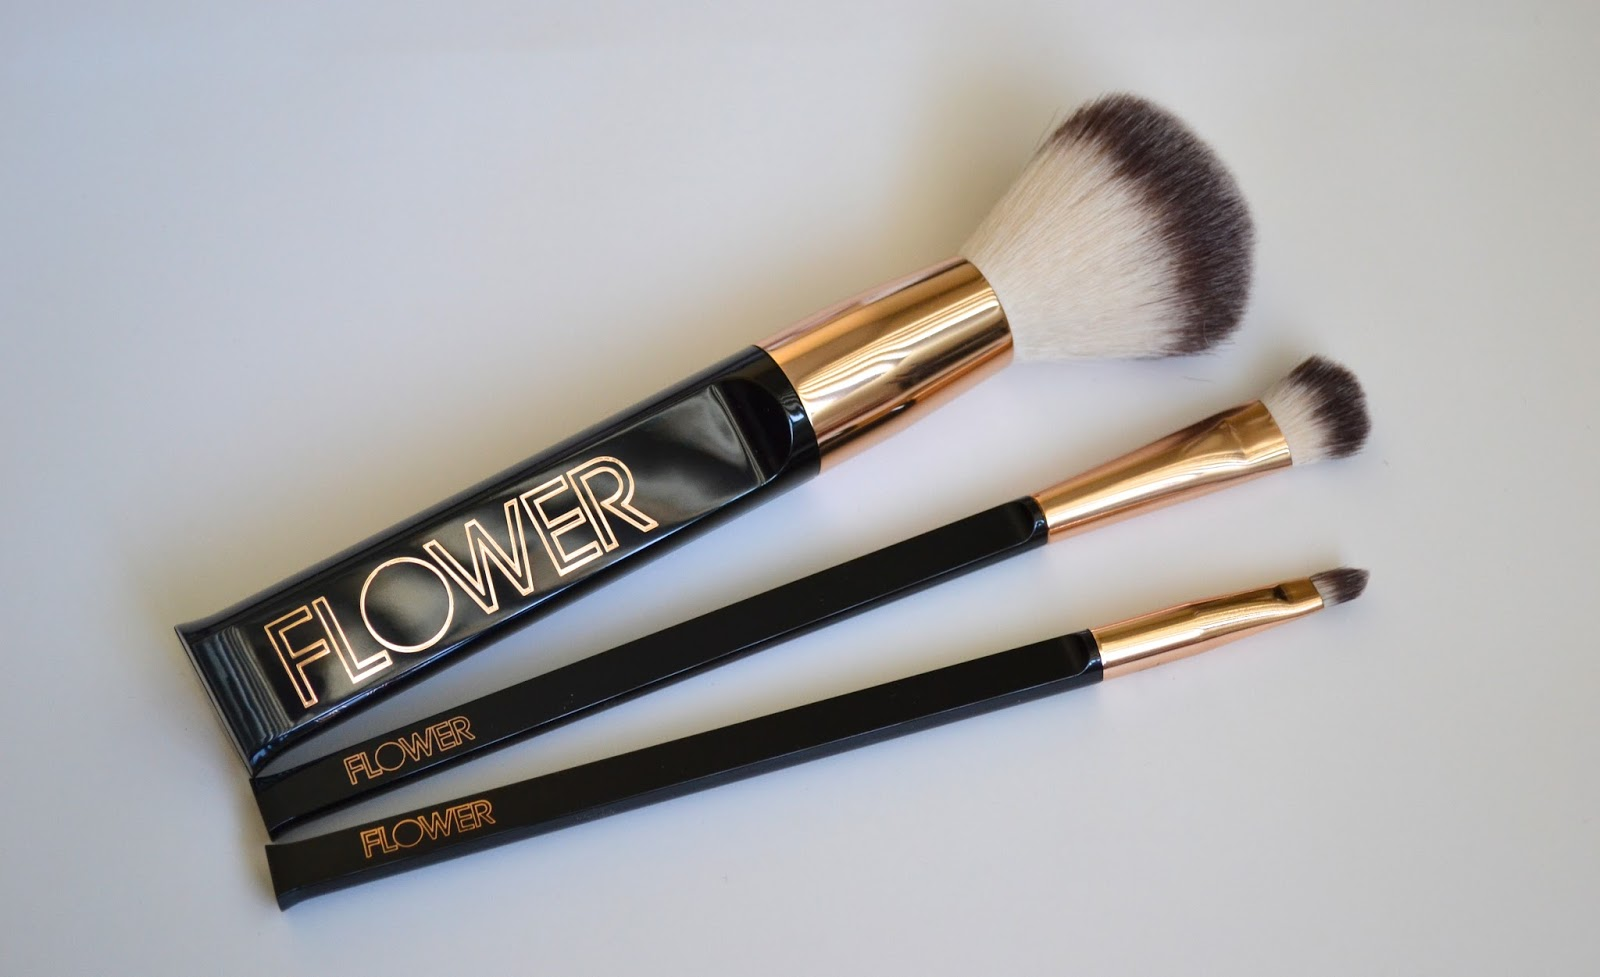 50e812af3e18 Flower Beauty Makeup Brushes Review   Saubhaya Makeup